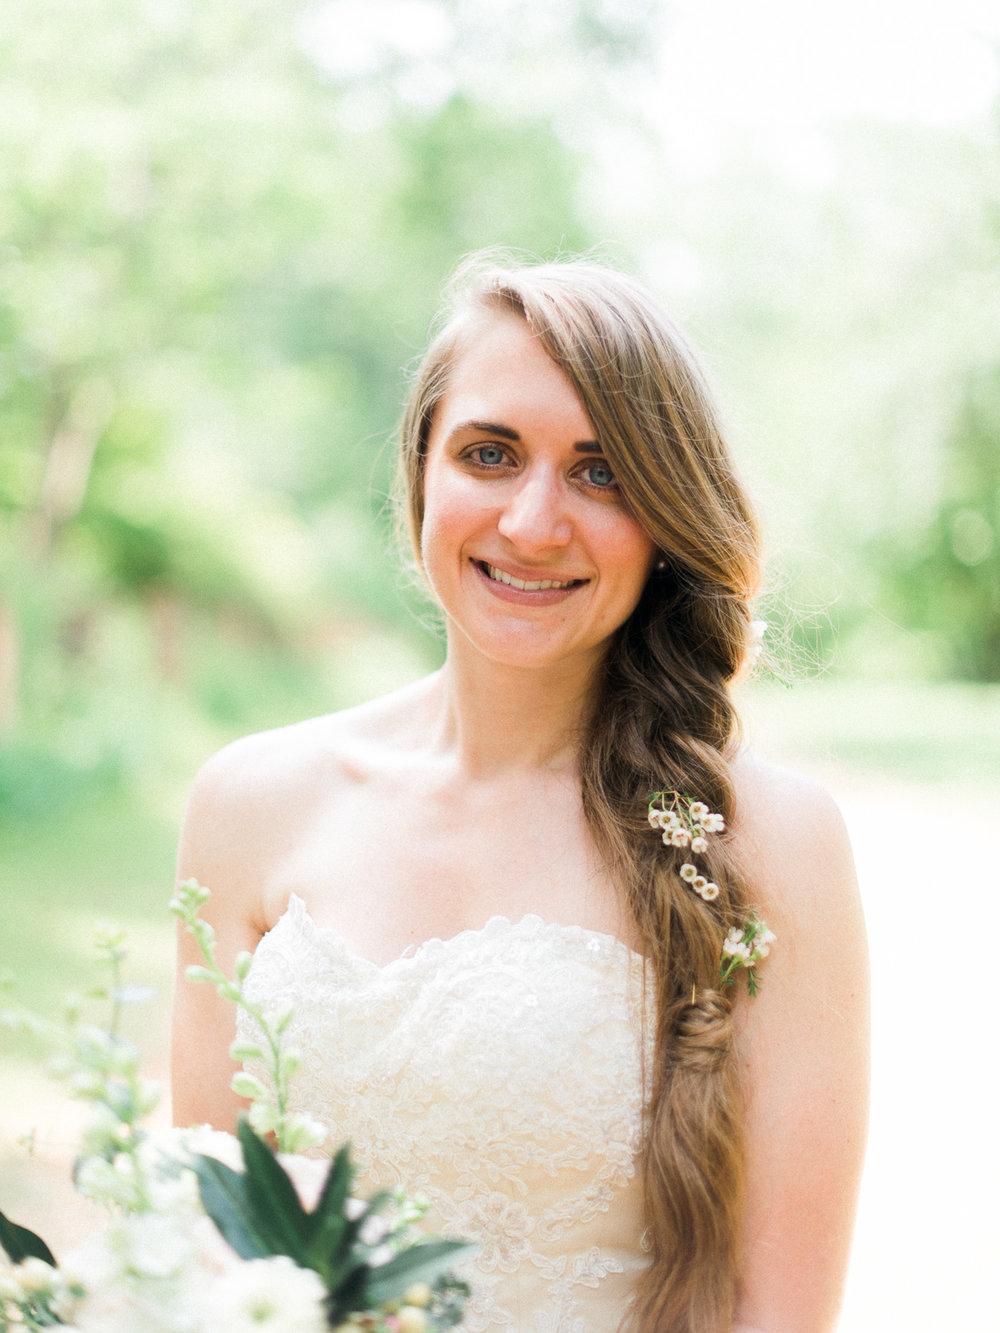 christinadavisphotography-romanticwedding-gardenweddinginspiration65.jpg